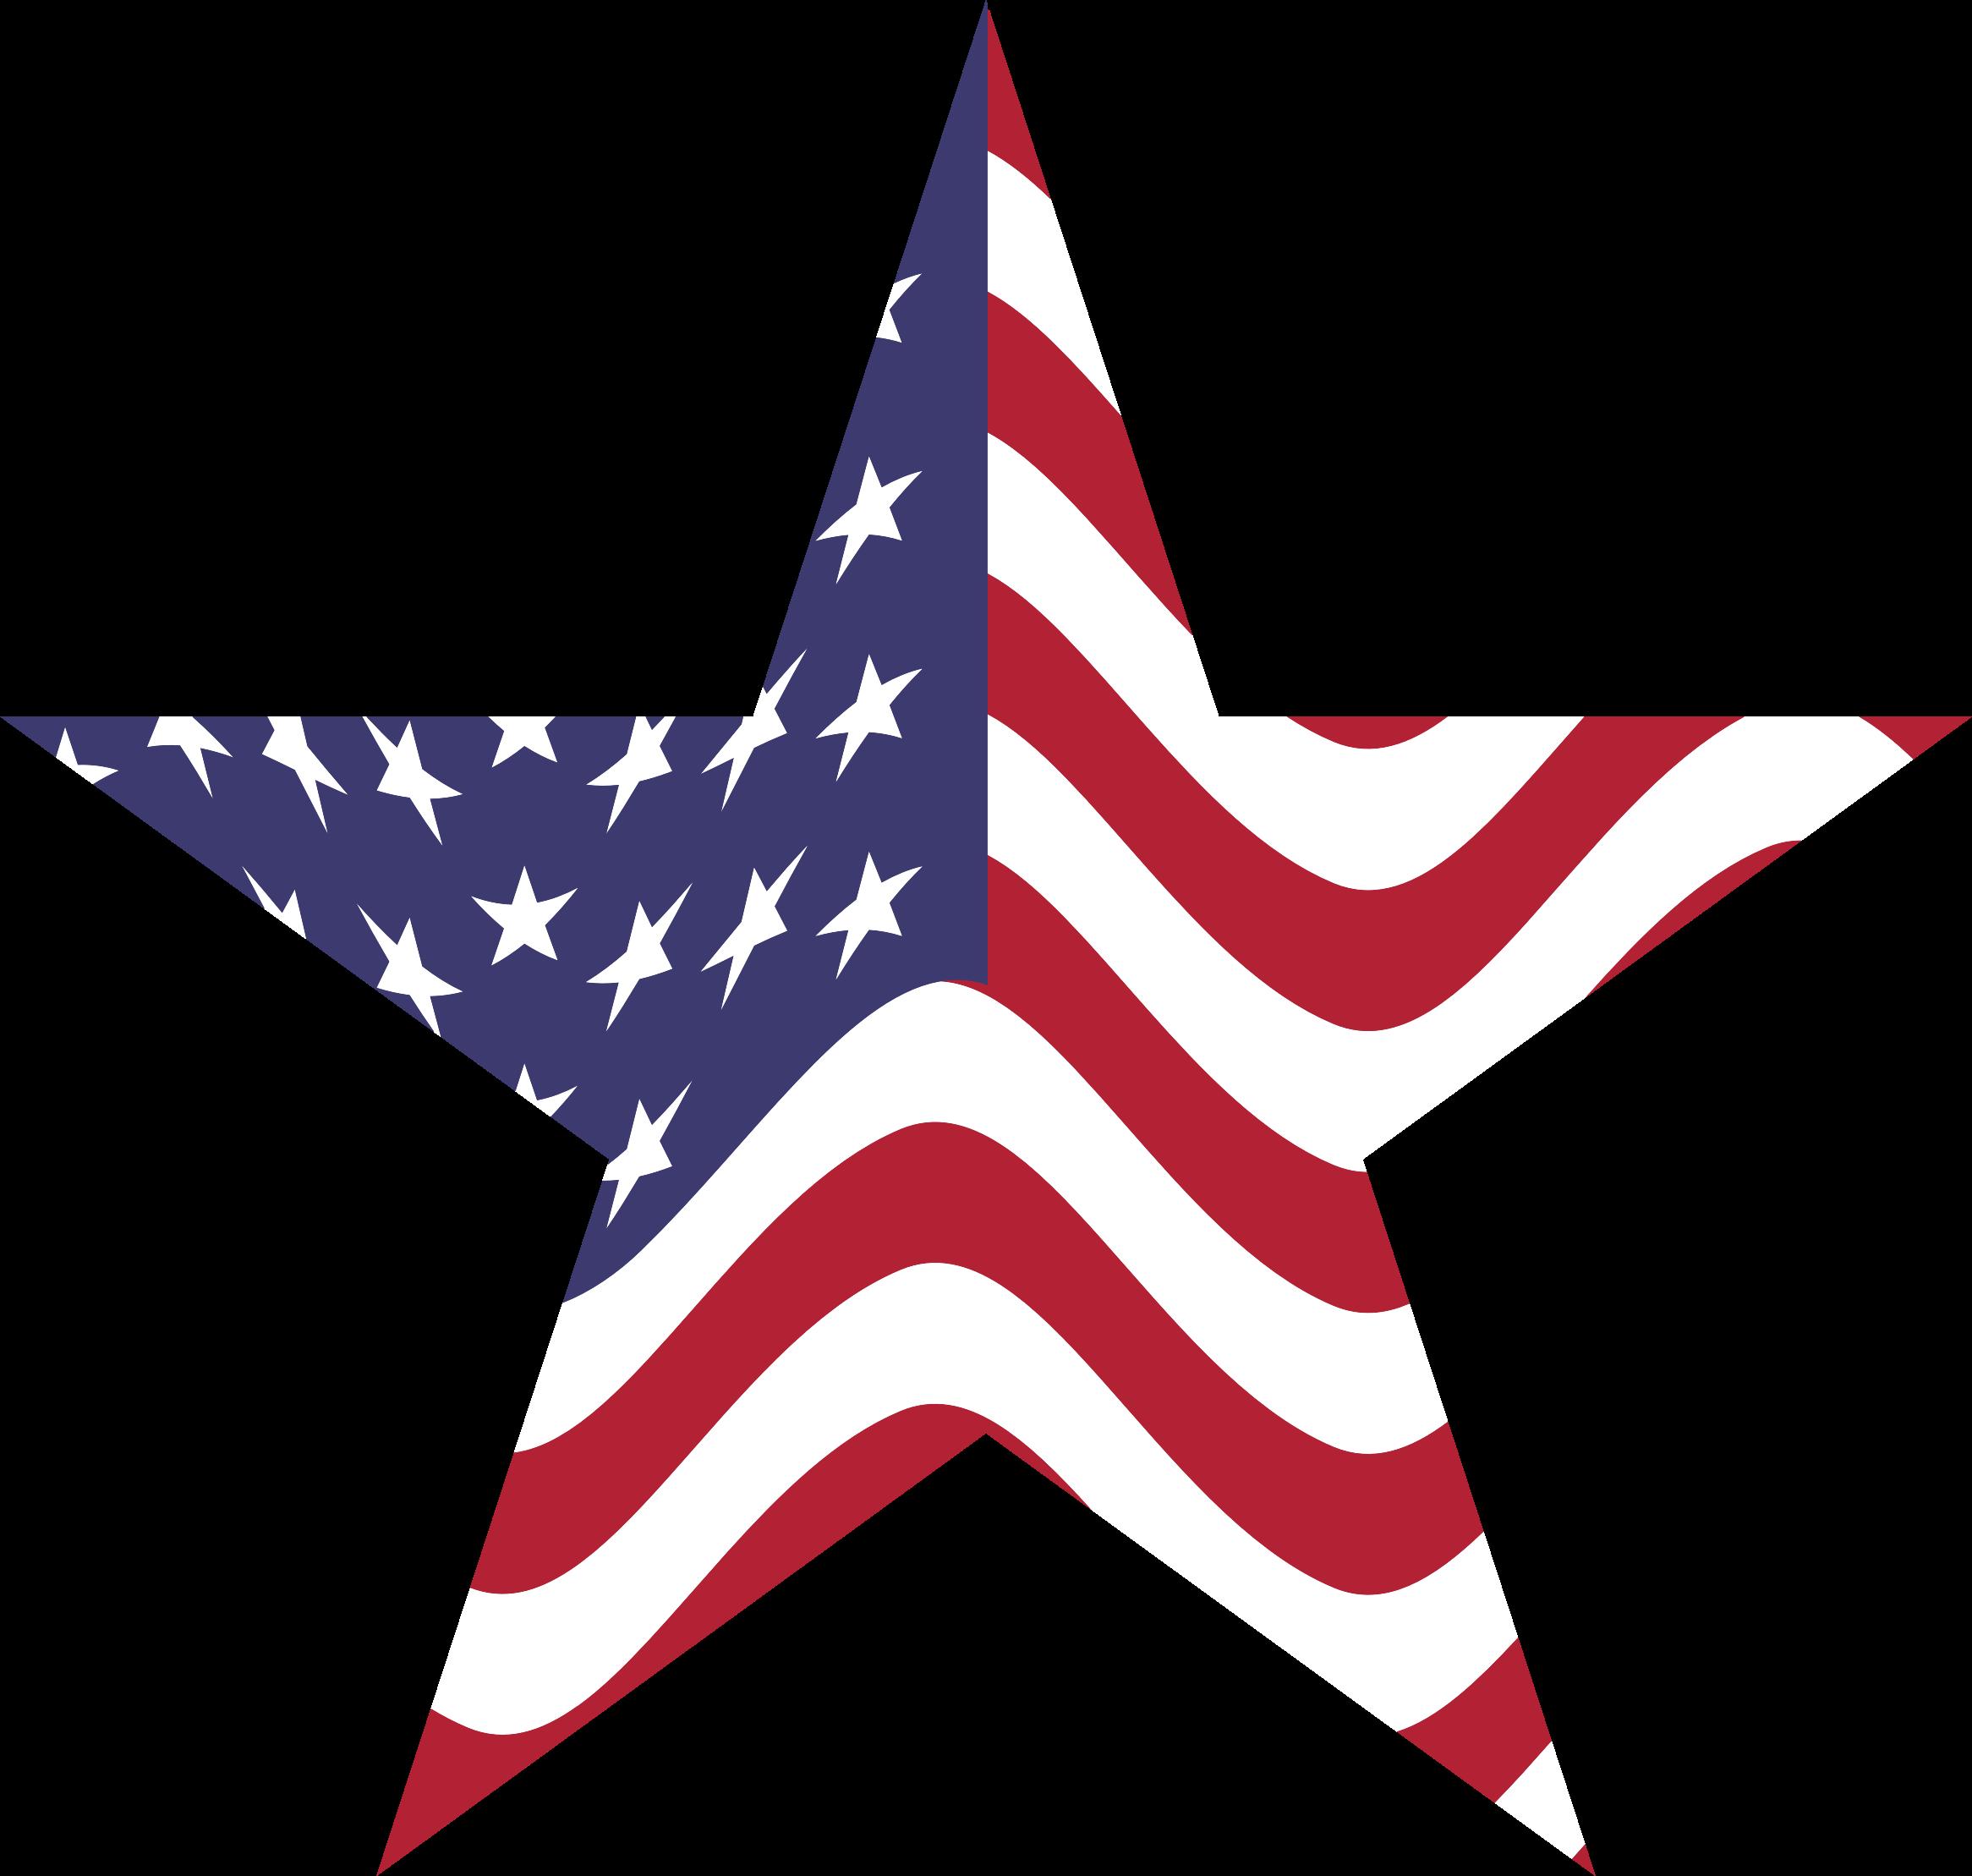 Clipart american flag star